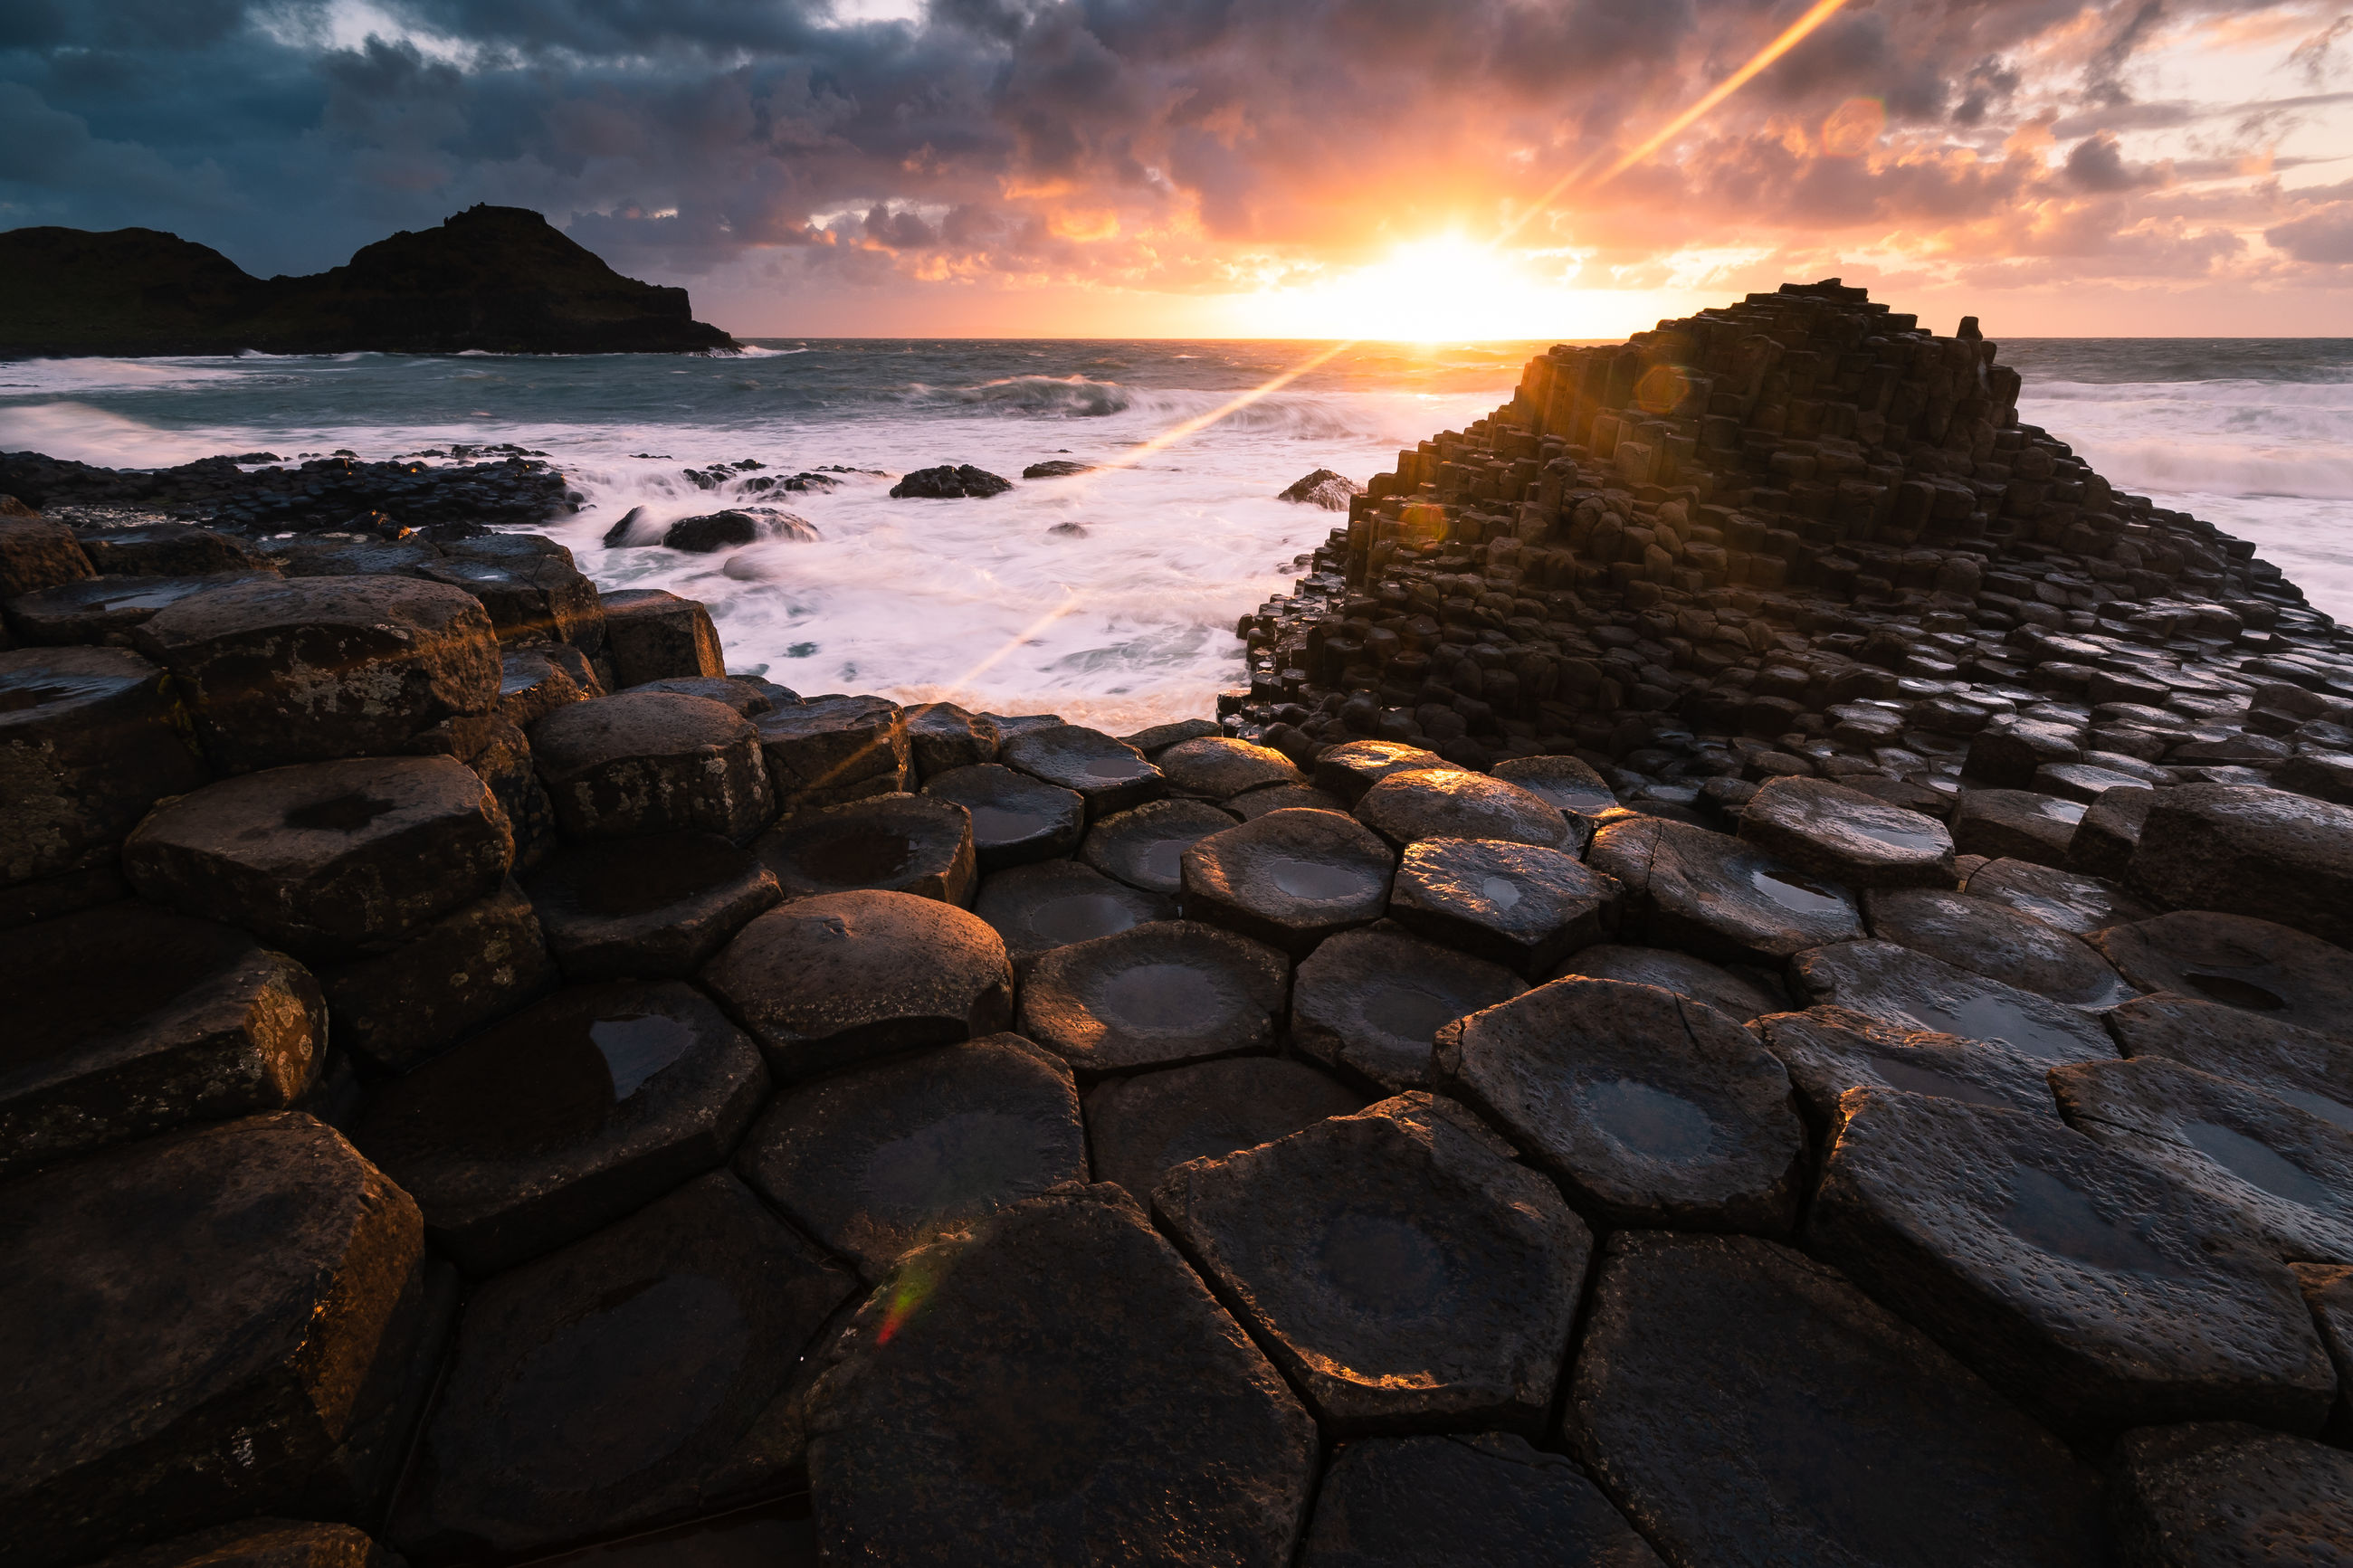 ROCKS ON SEA SHORE AGAINST SUNSET SKY